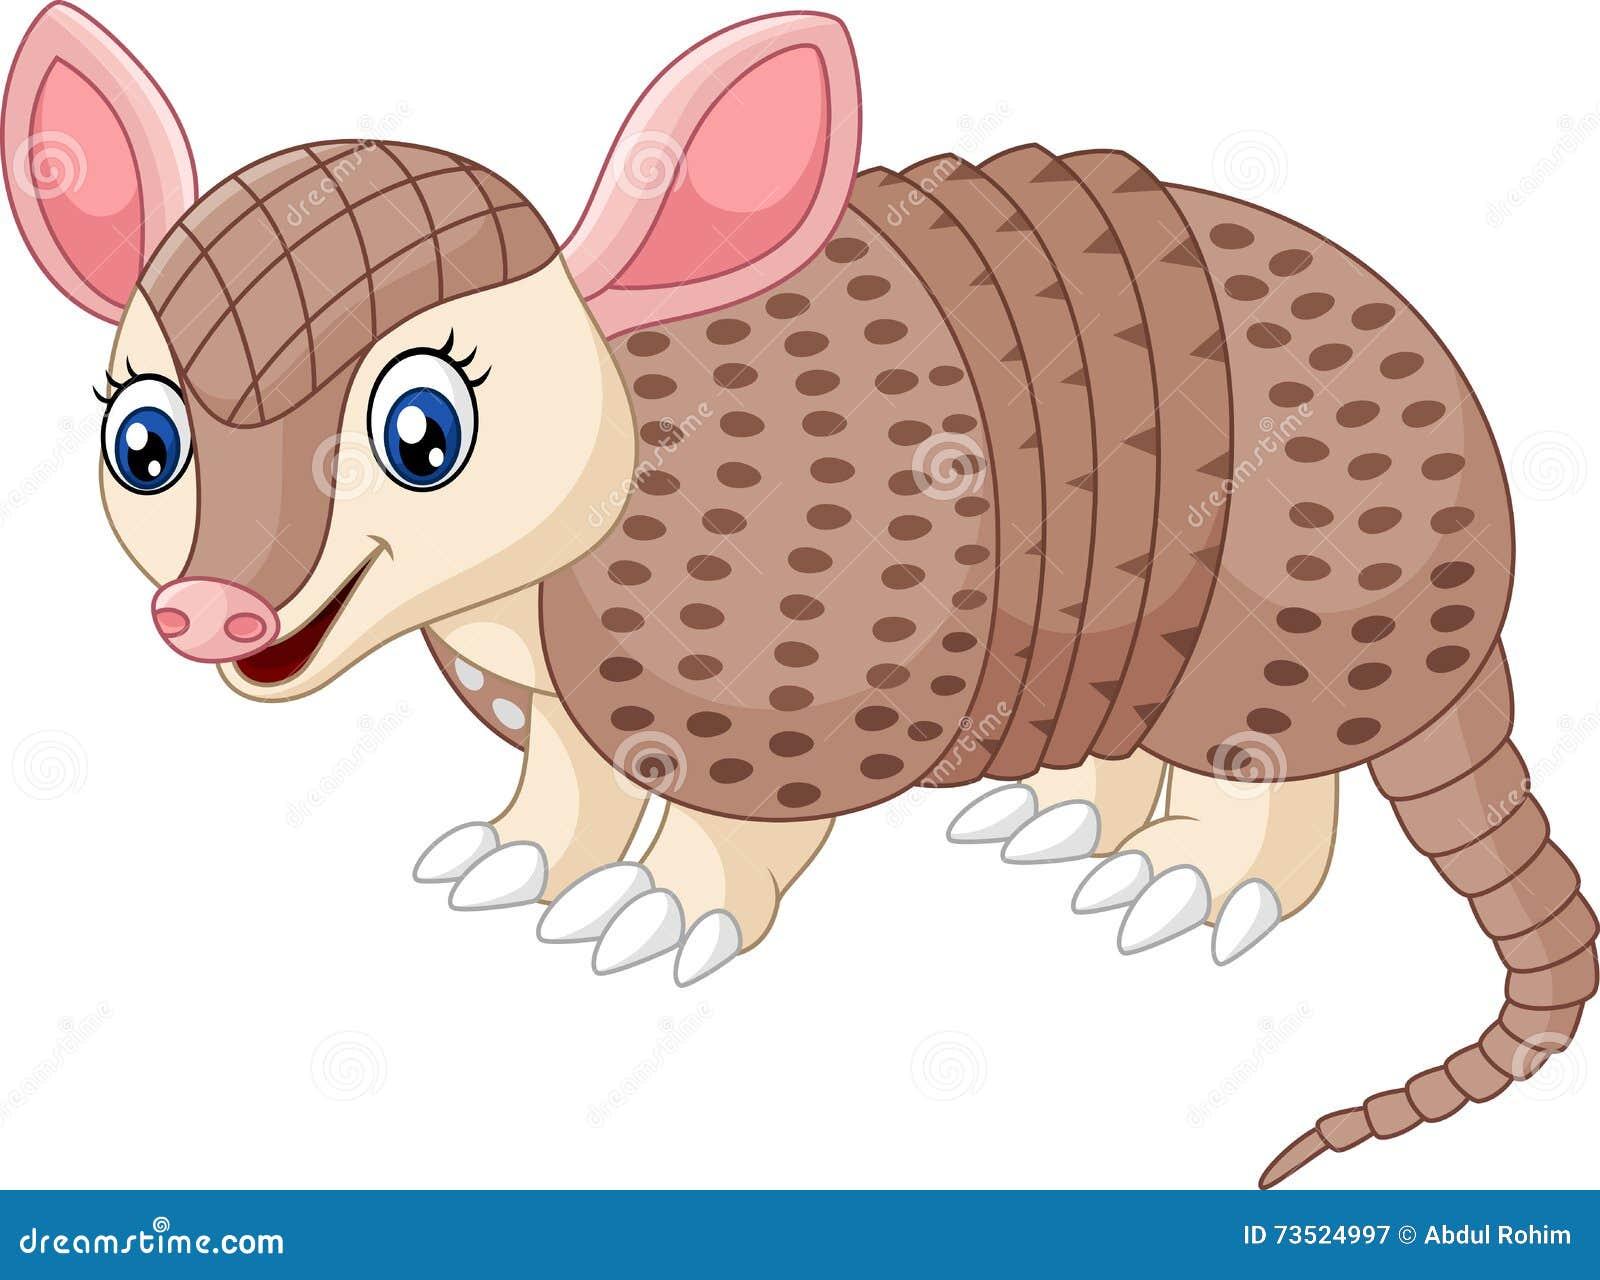 armadillo stock illustrations – 387 armadillo stock illustrations